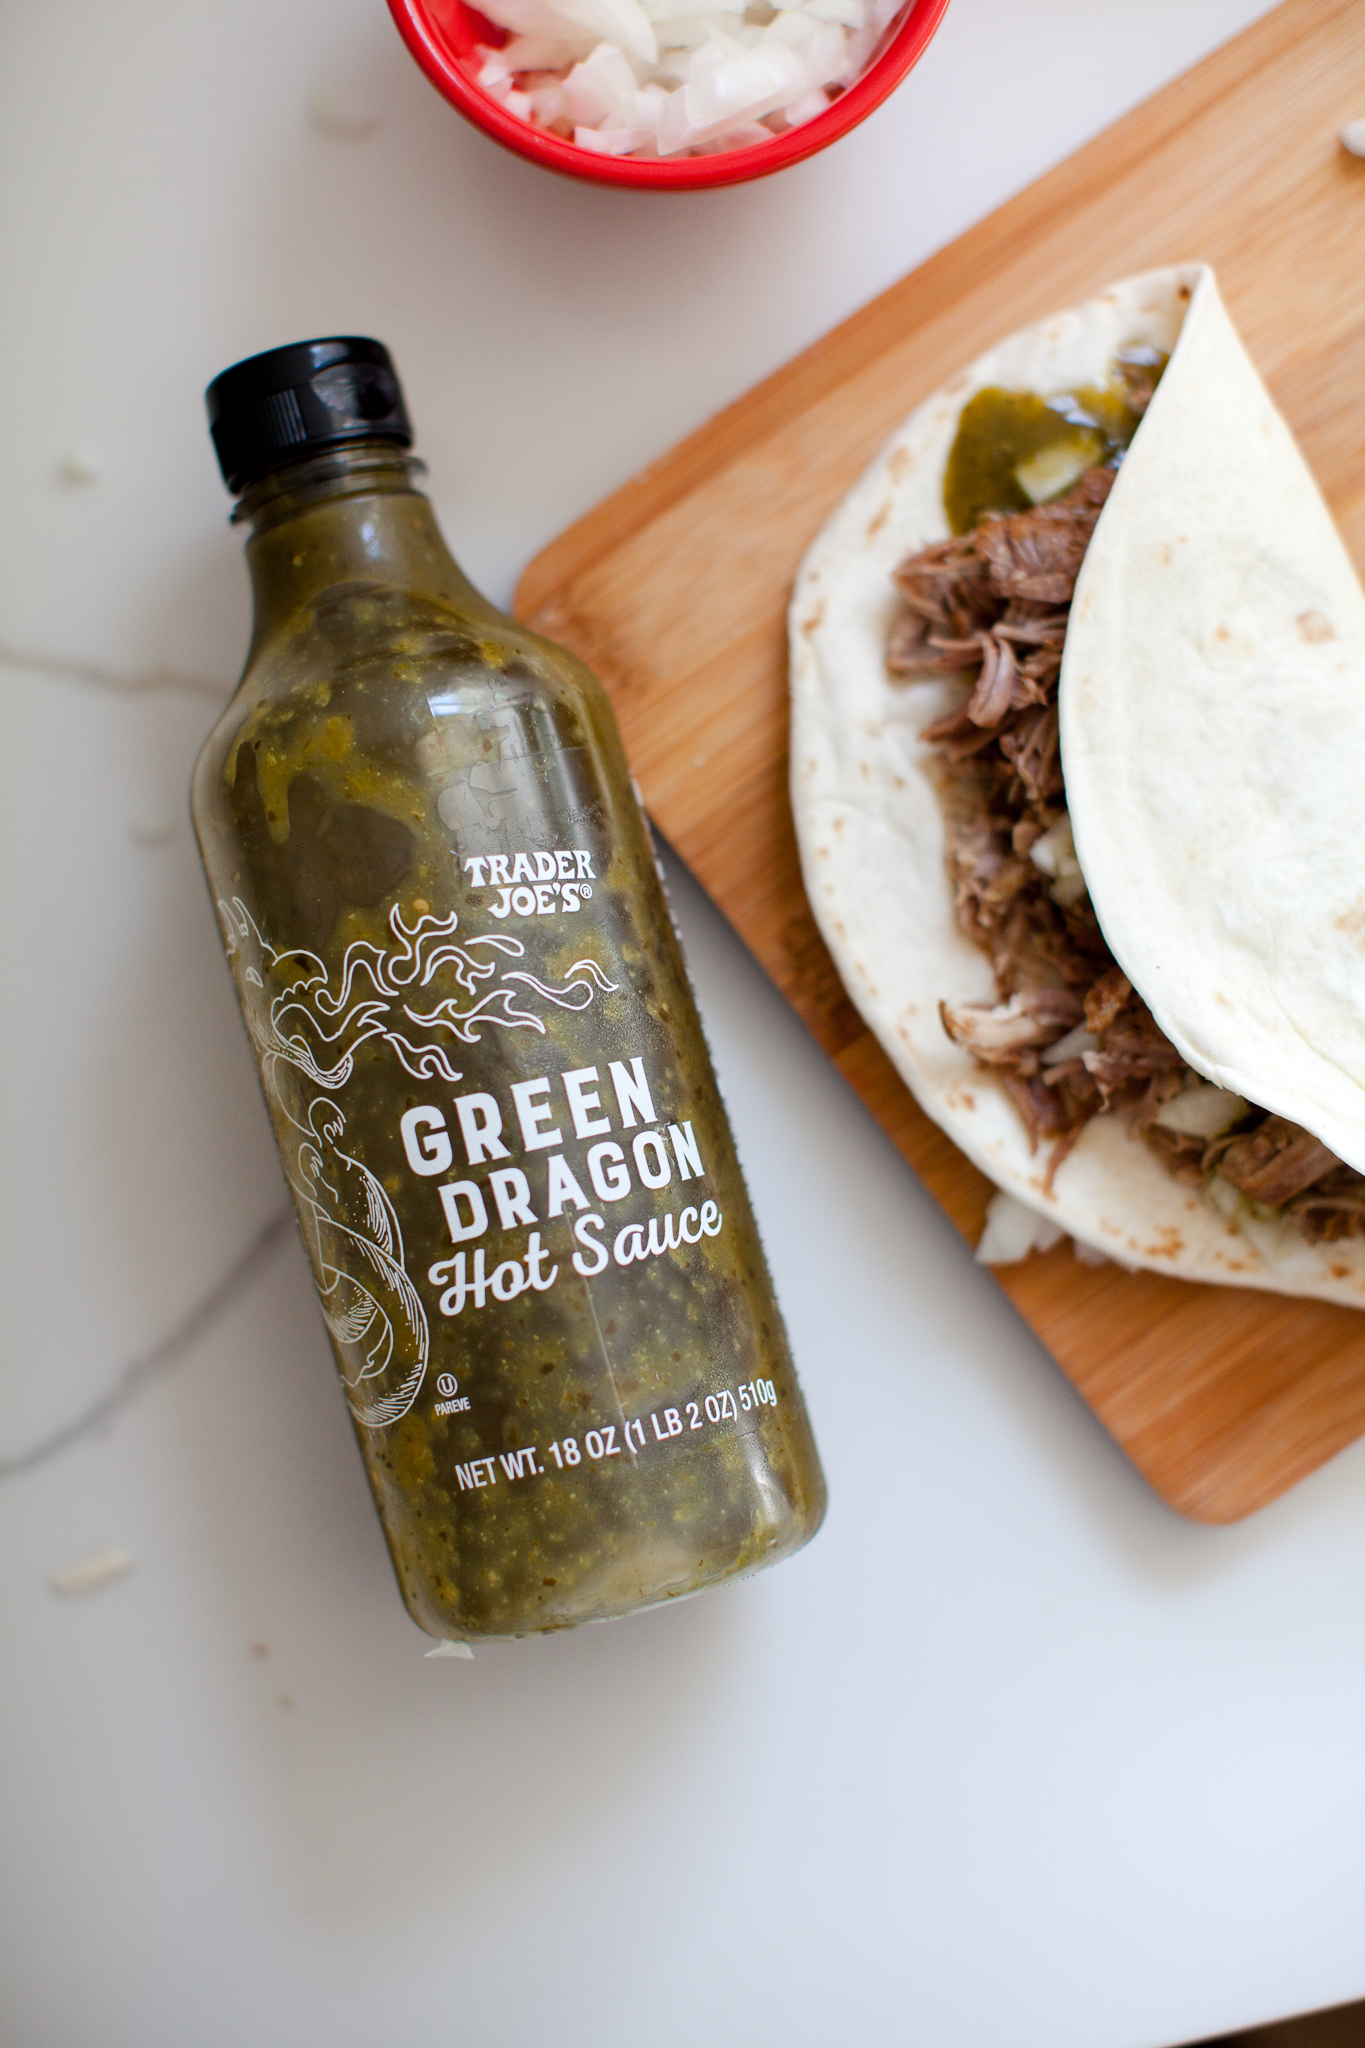 Trader Joes Inspired Easy Instant Pork Tacos